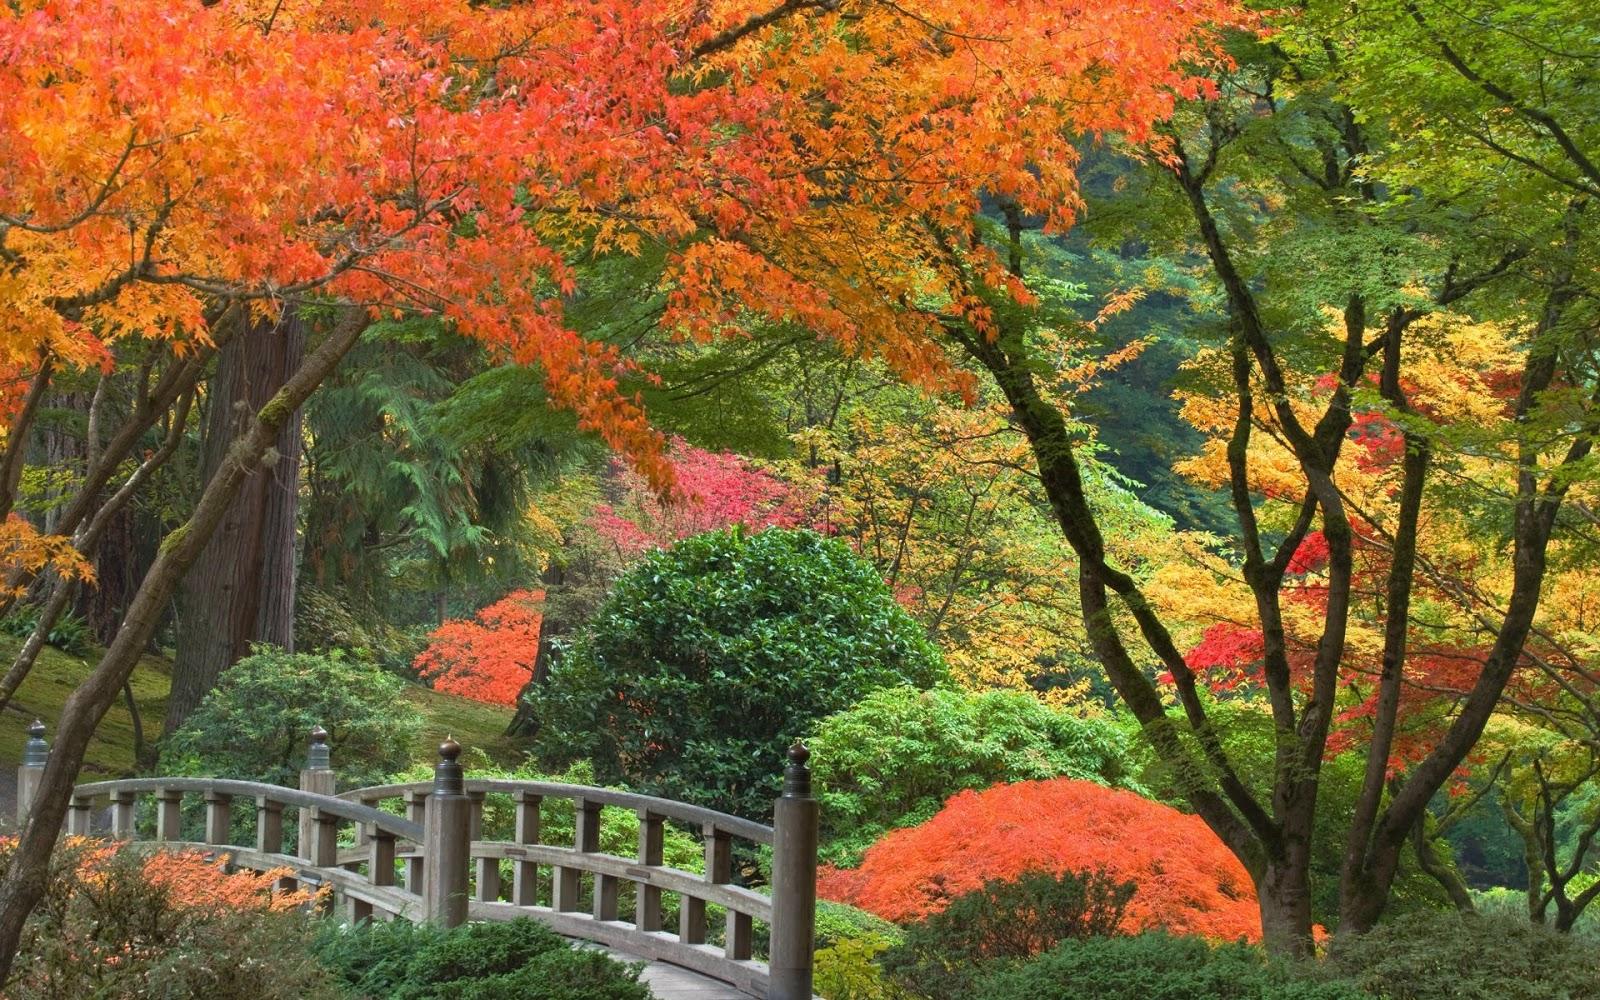 Autumn Nature HD Wallpaper Download 1080p 1920x1080 Ultra HD 1600x1000